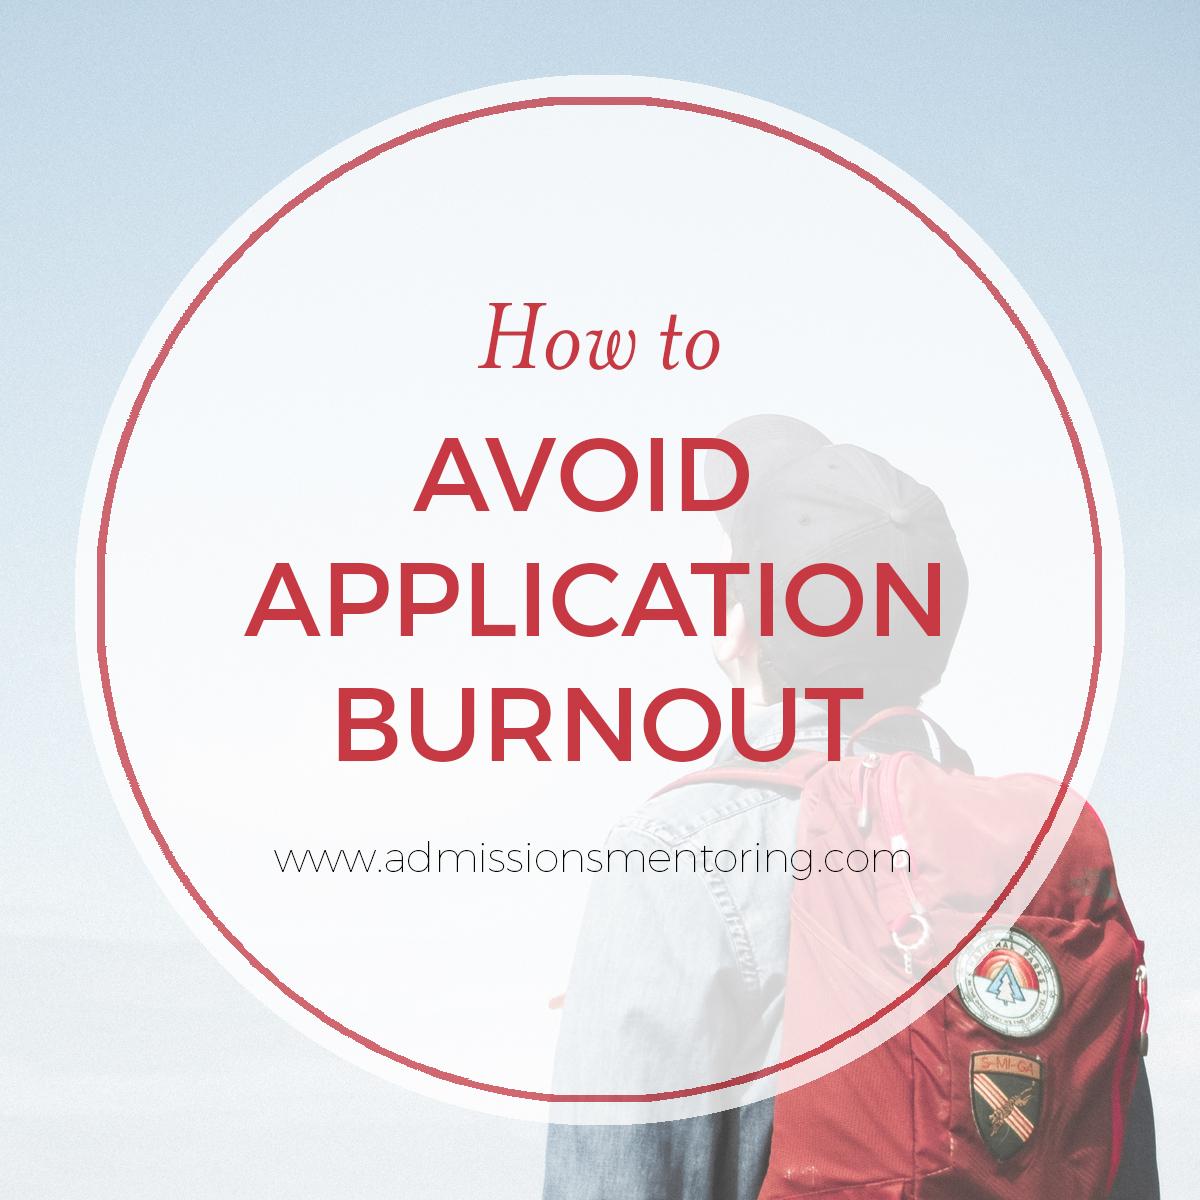 Admissions-Mentoring-Application-Burnout.jpg